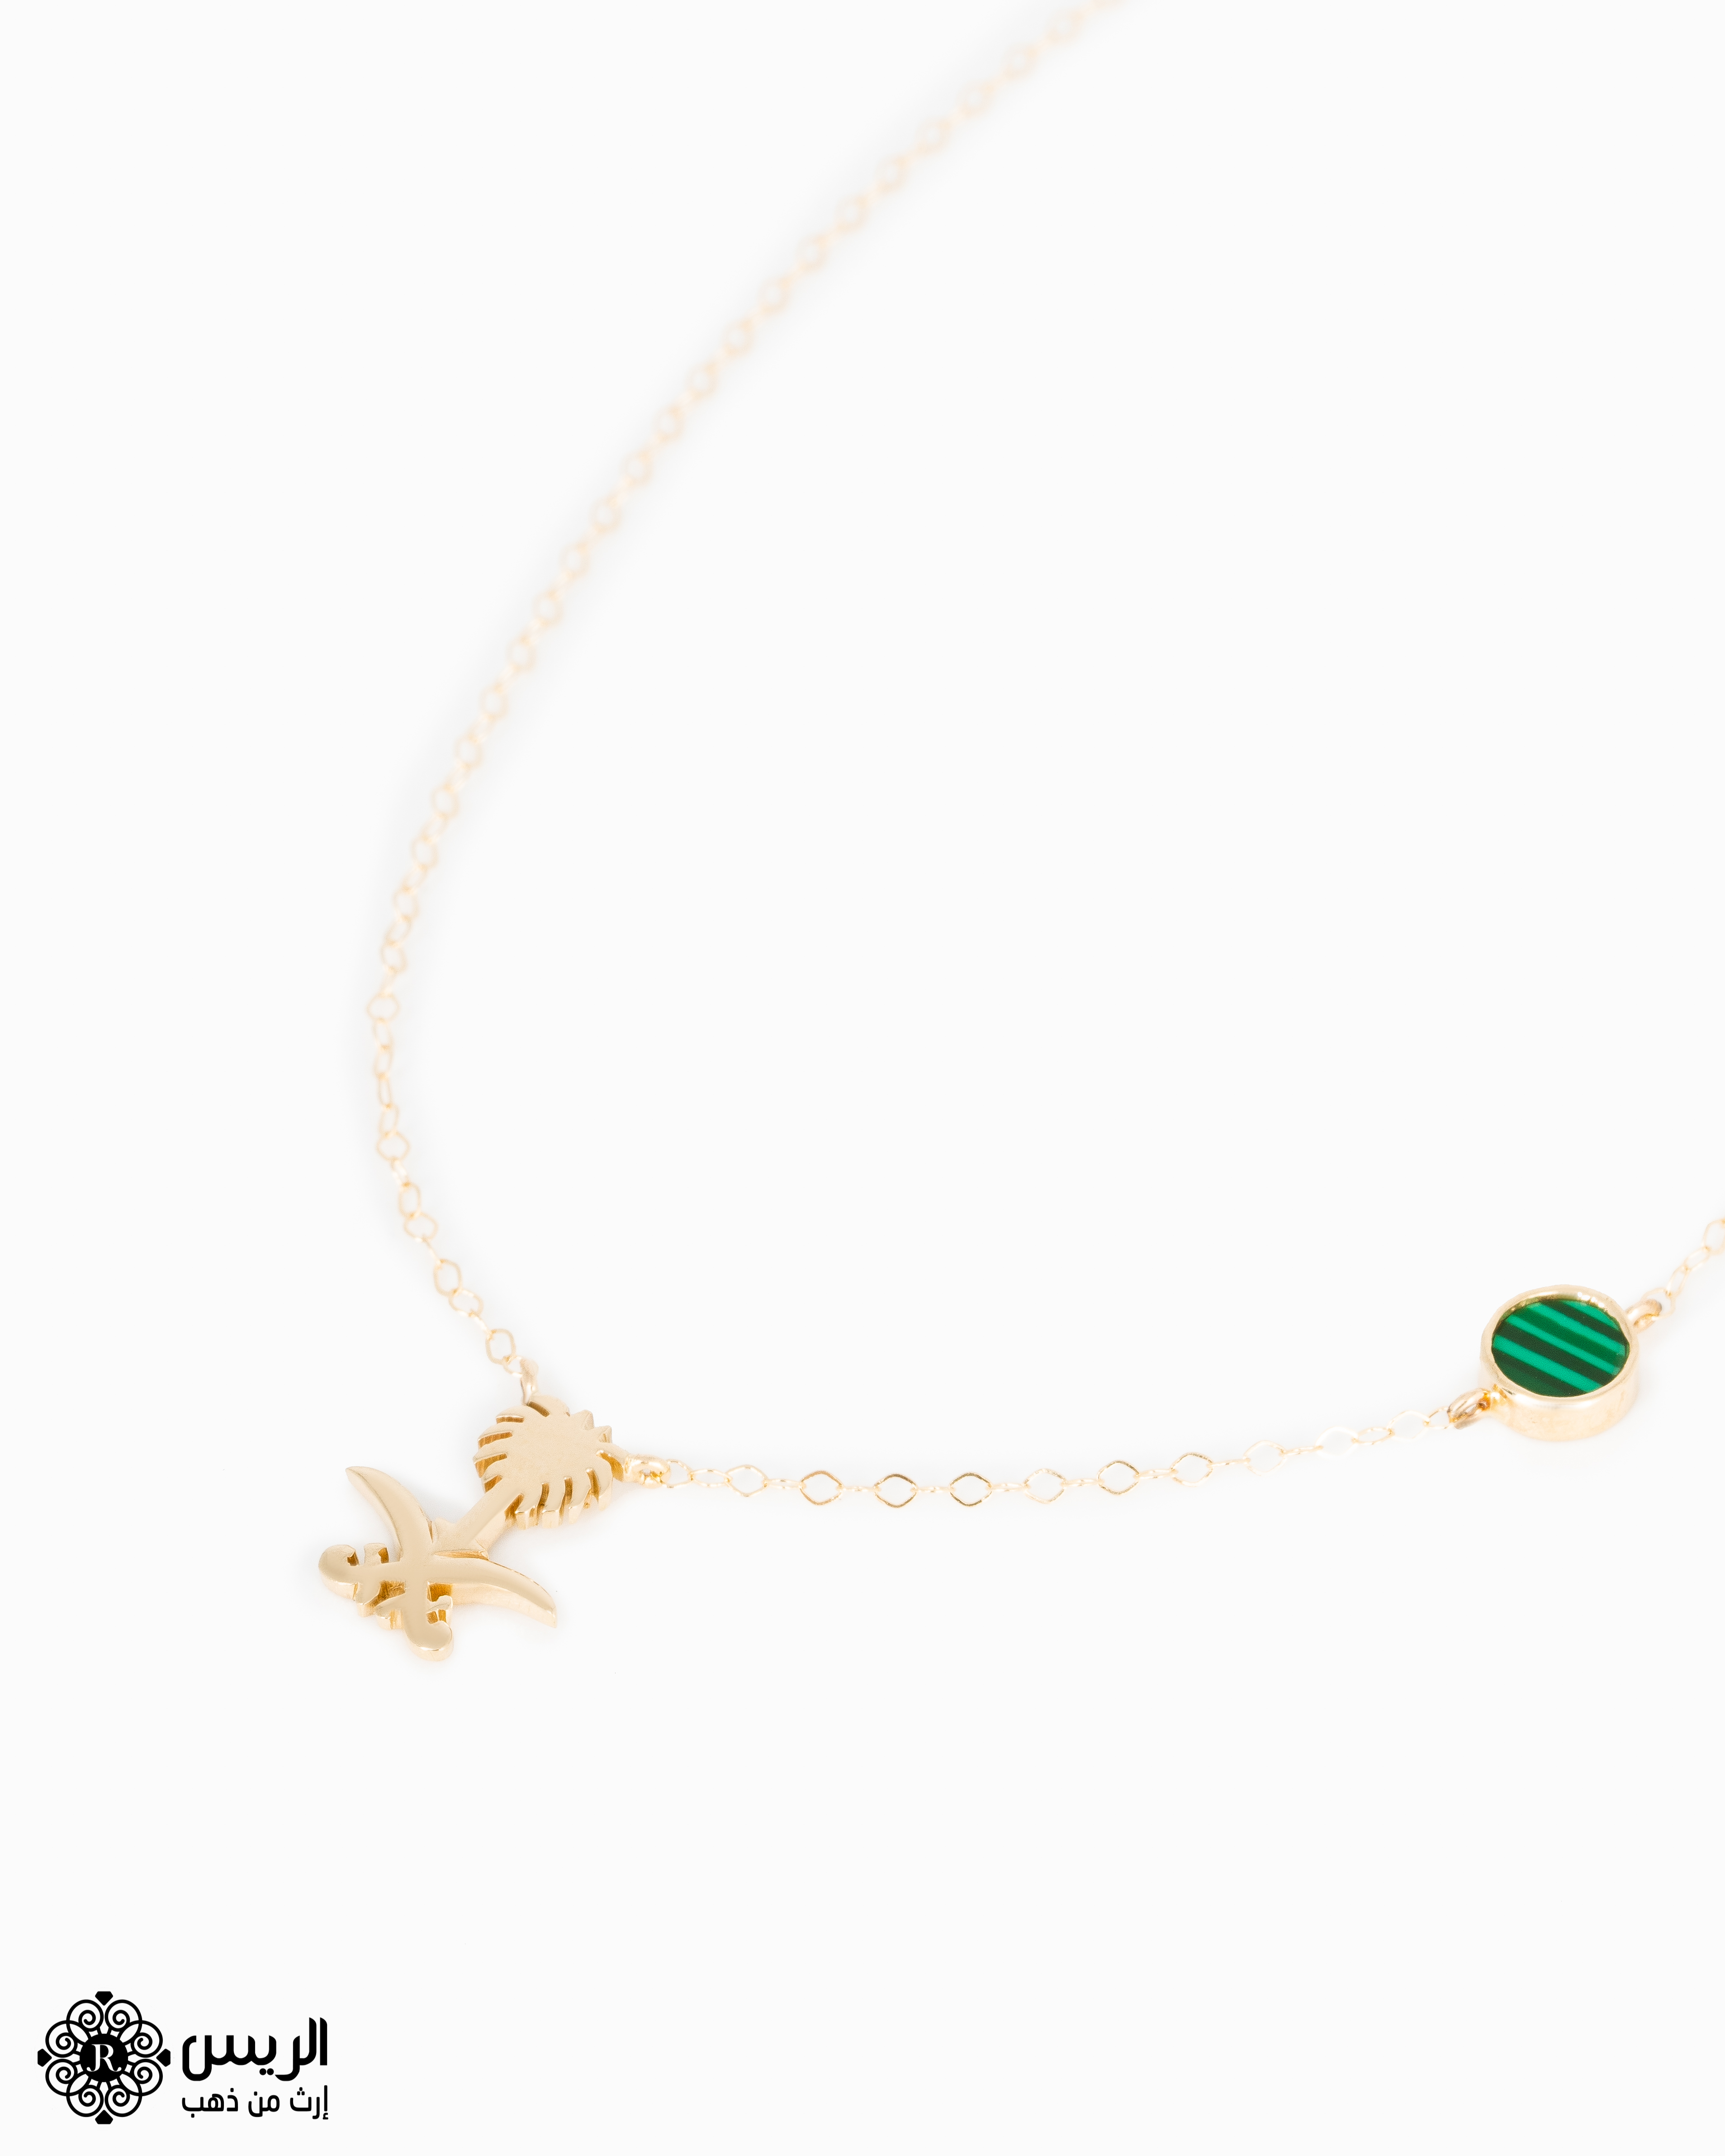 Raies jewelry Two Swords and Palm Tree Necklace تعليقة مع سلسلة سيفين و نخلة الريس للمجوهرات